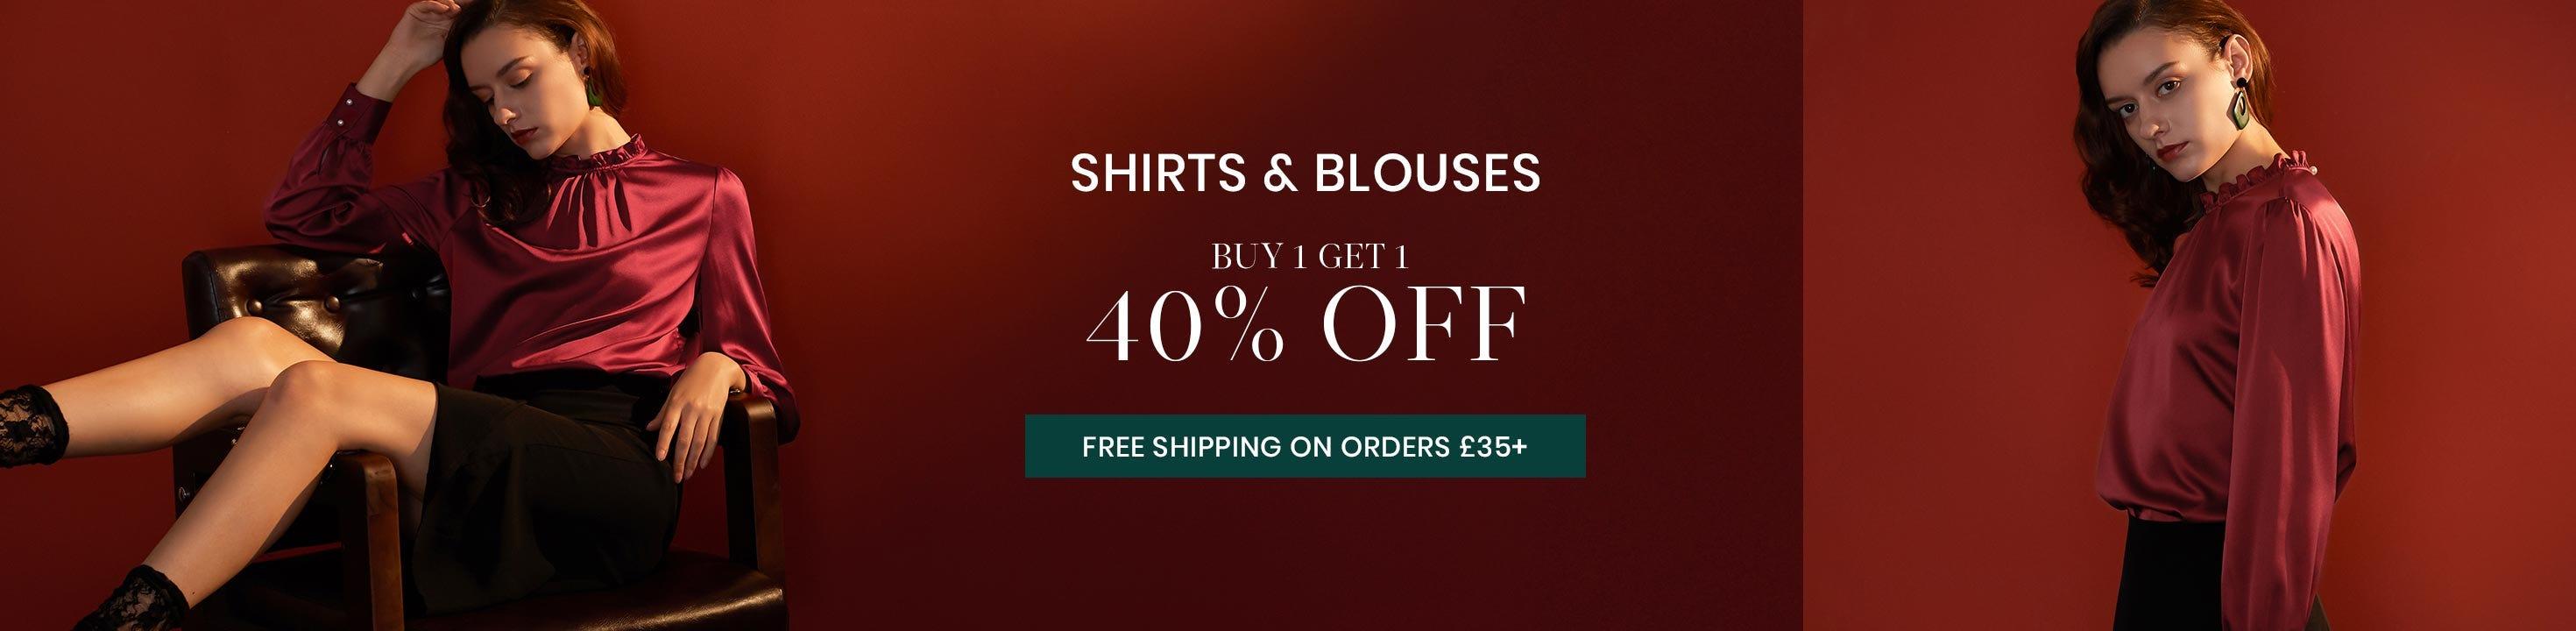 Shirts & Blouses